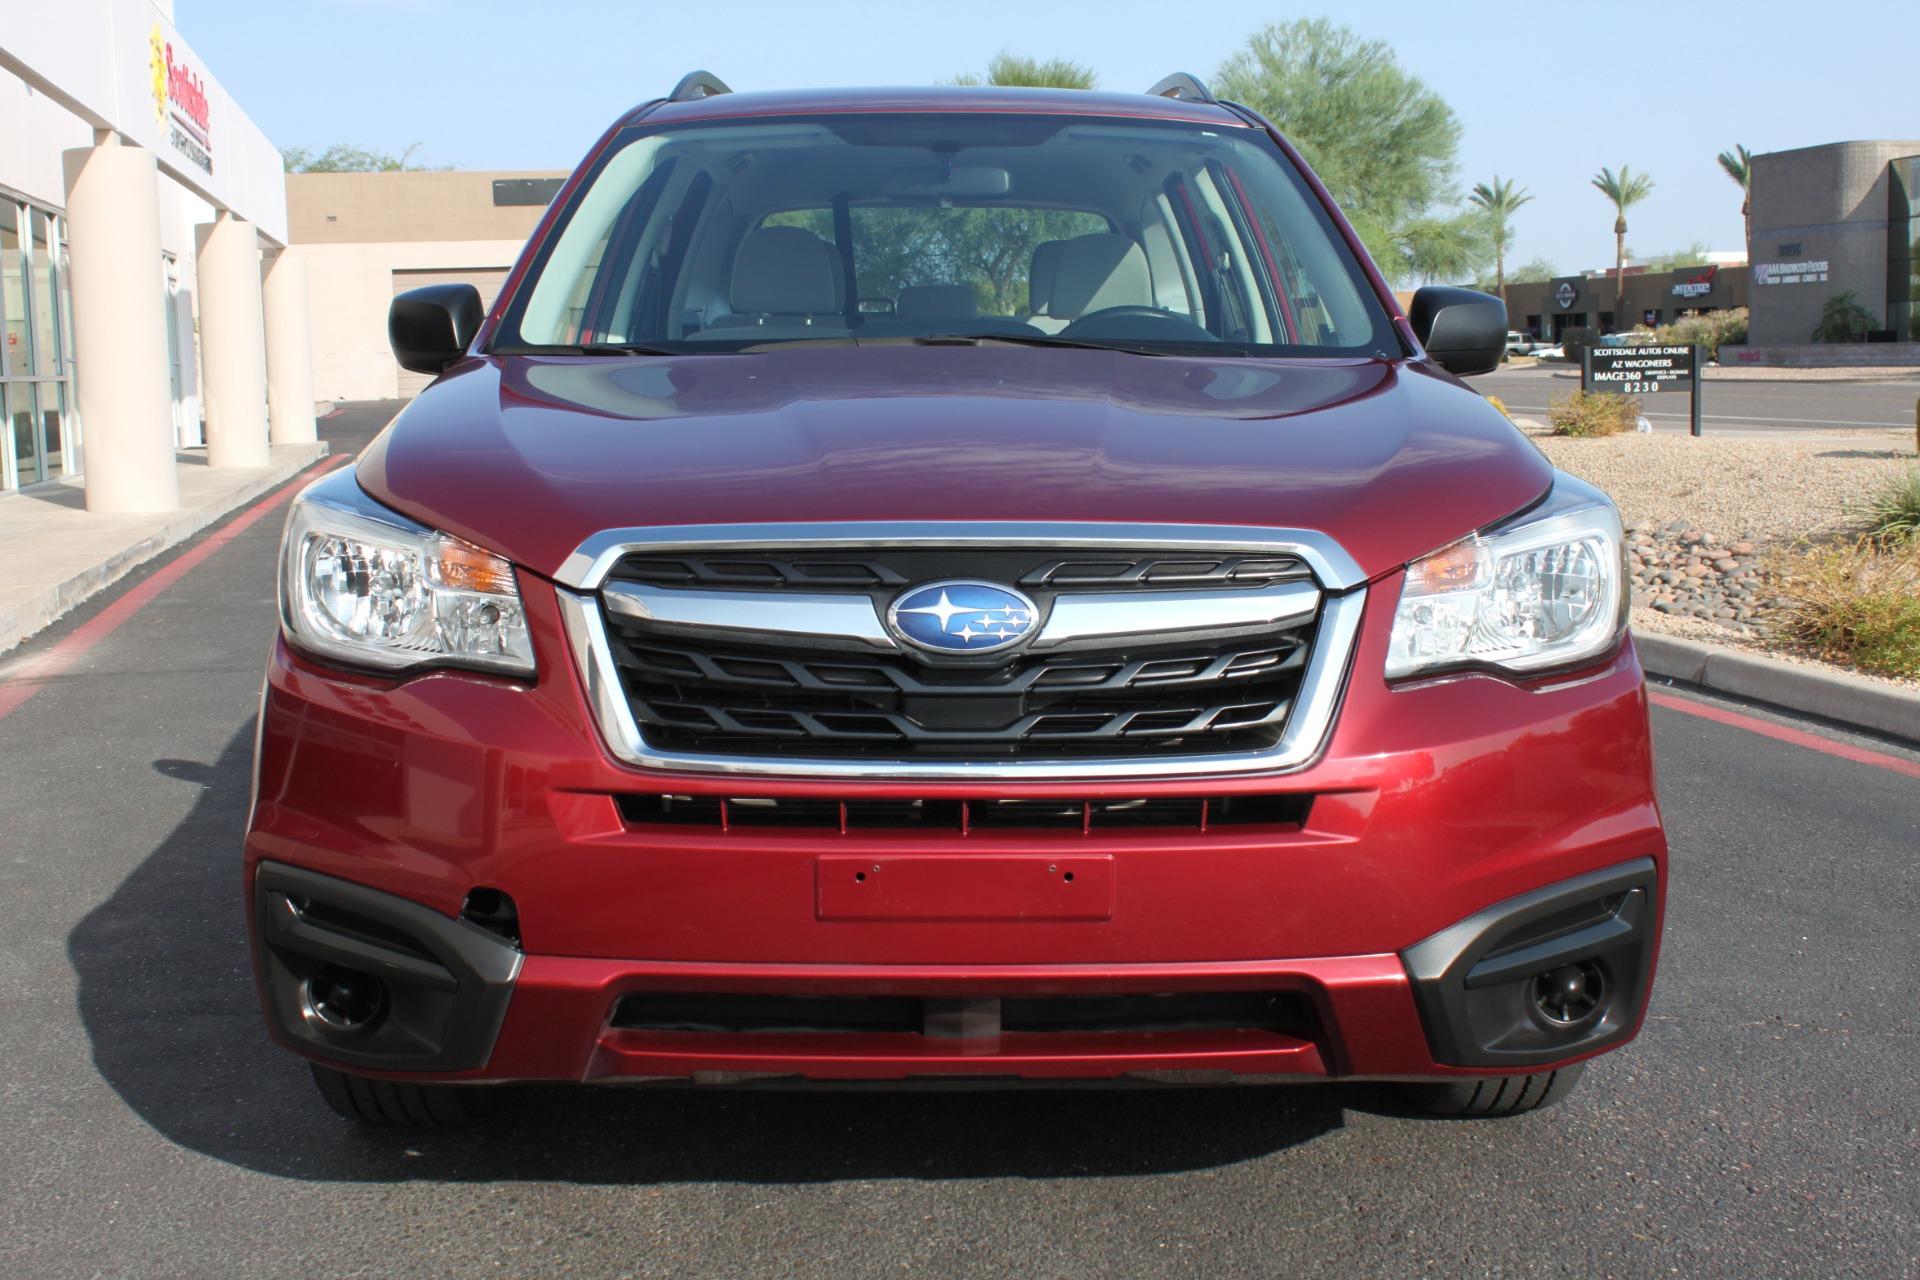 Used-2017-Subaru-Forester-25i-All-Wheel-Drive-25i-Wrangler